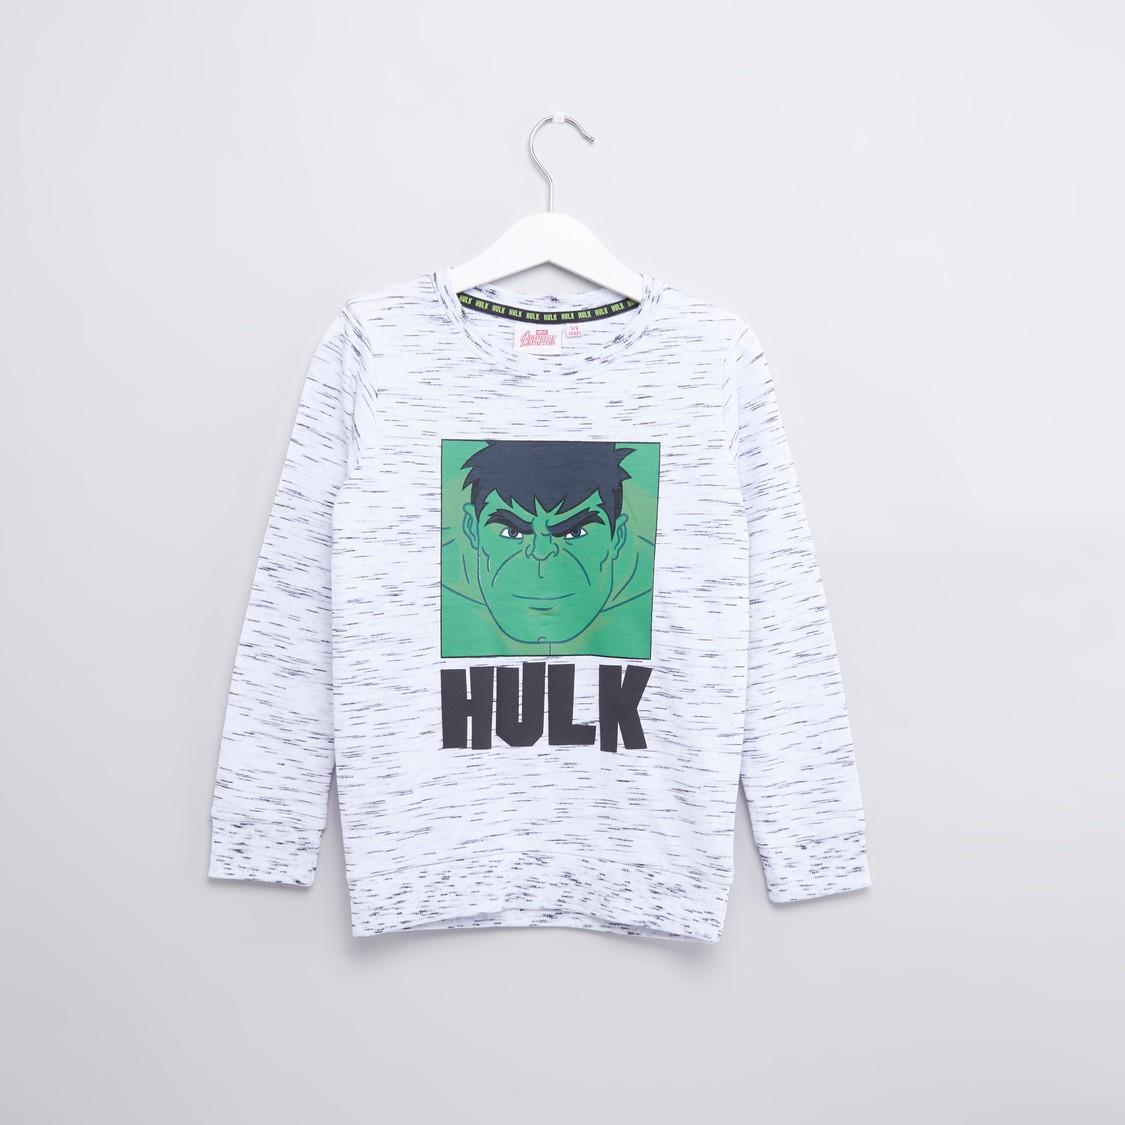 Hulk Printed Sweatshirt with Round Neck and Long Sleeves